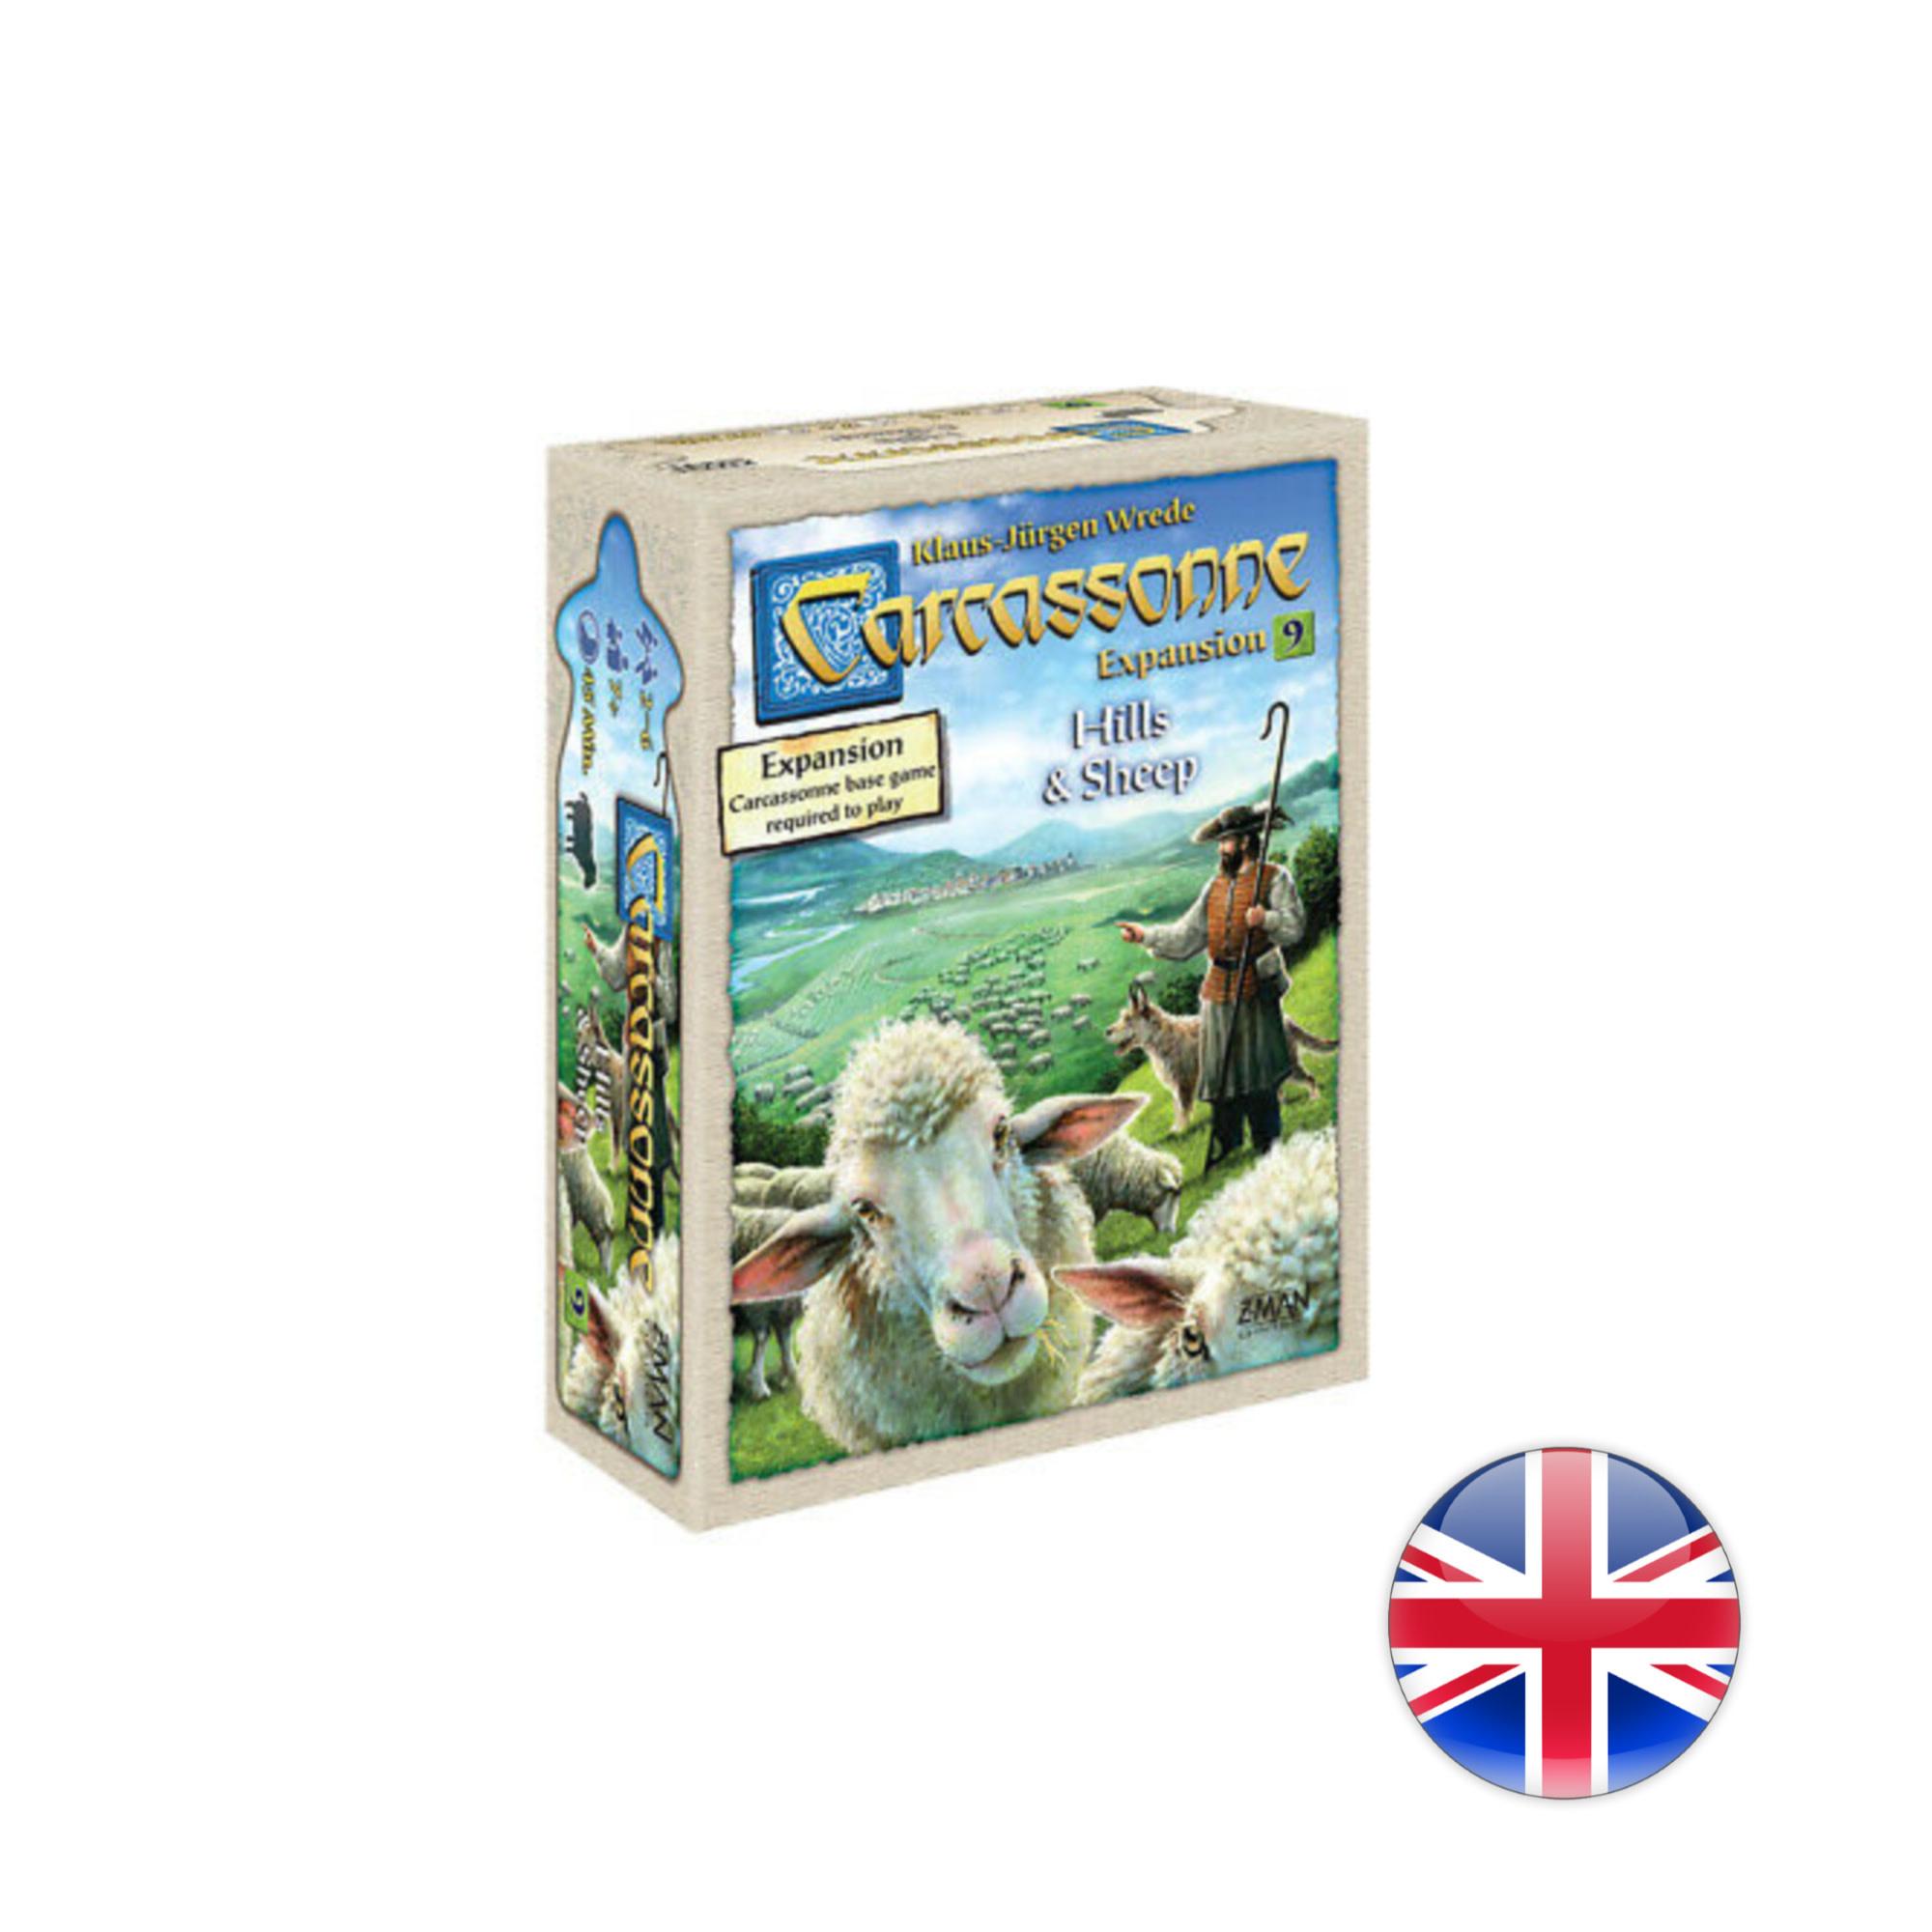 Carcassonne Exp : 9 - Hills & Sheep